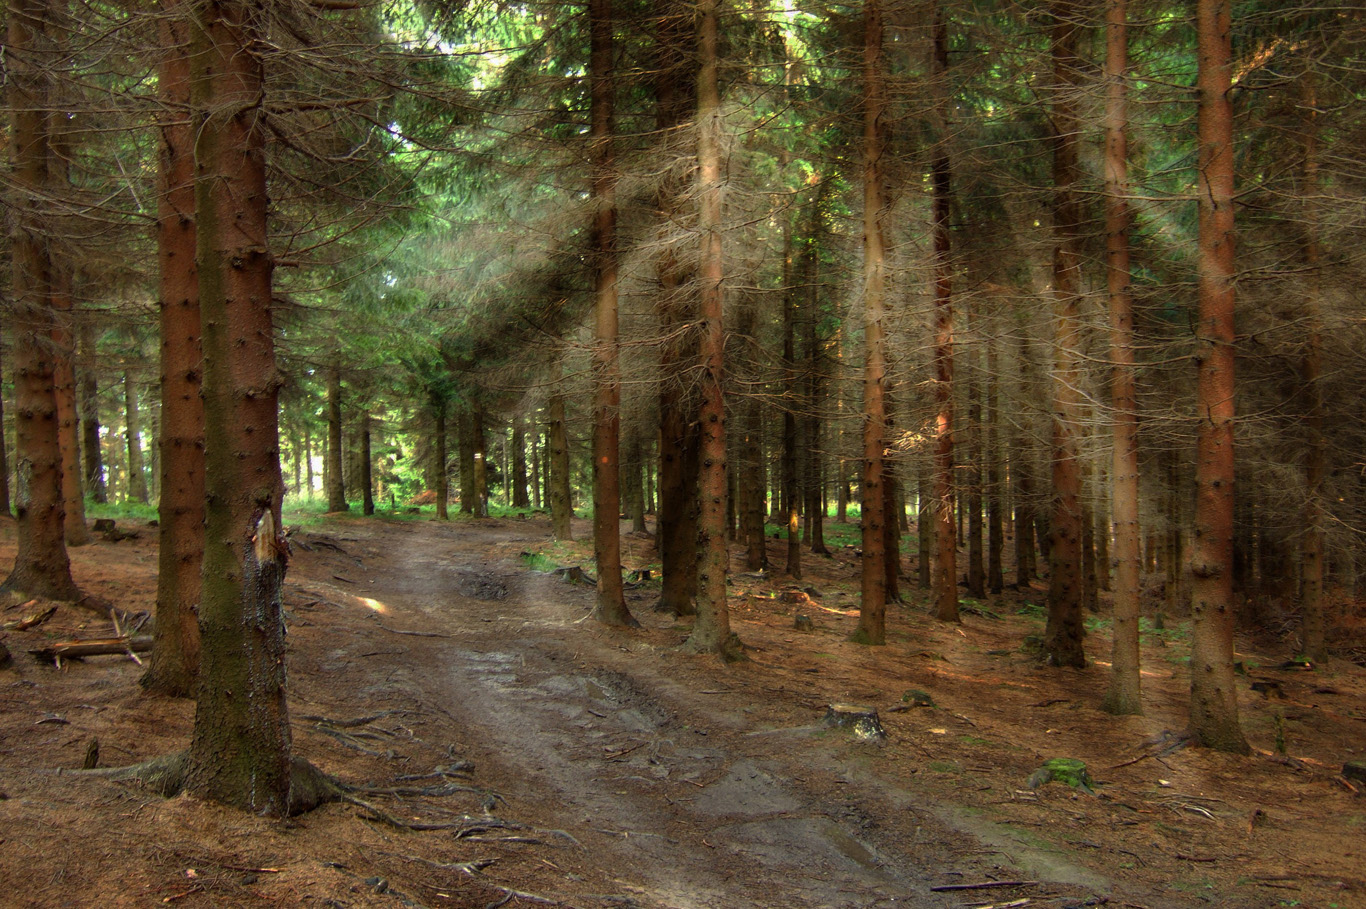 Sun rays among spruce trees